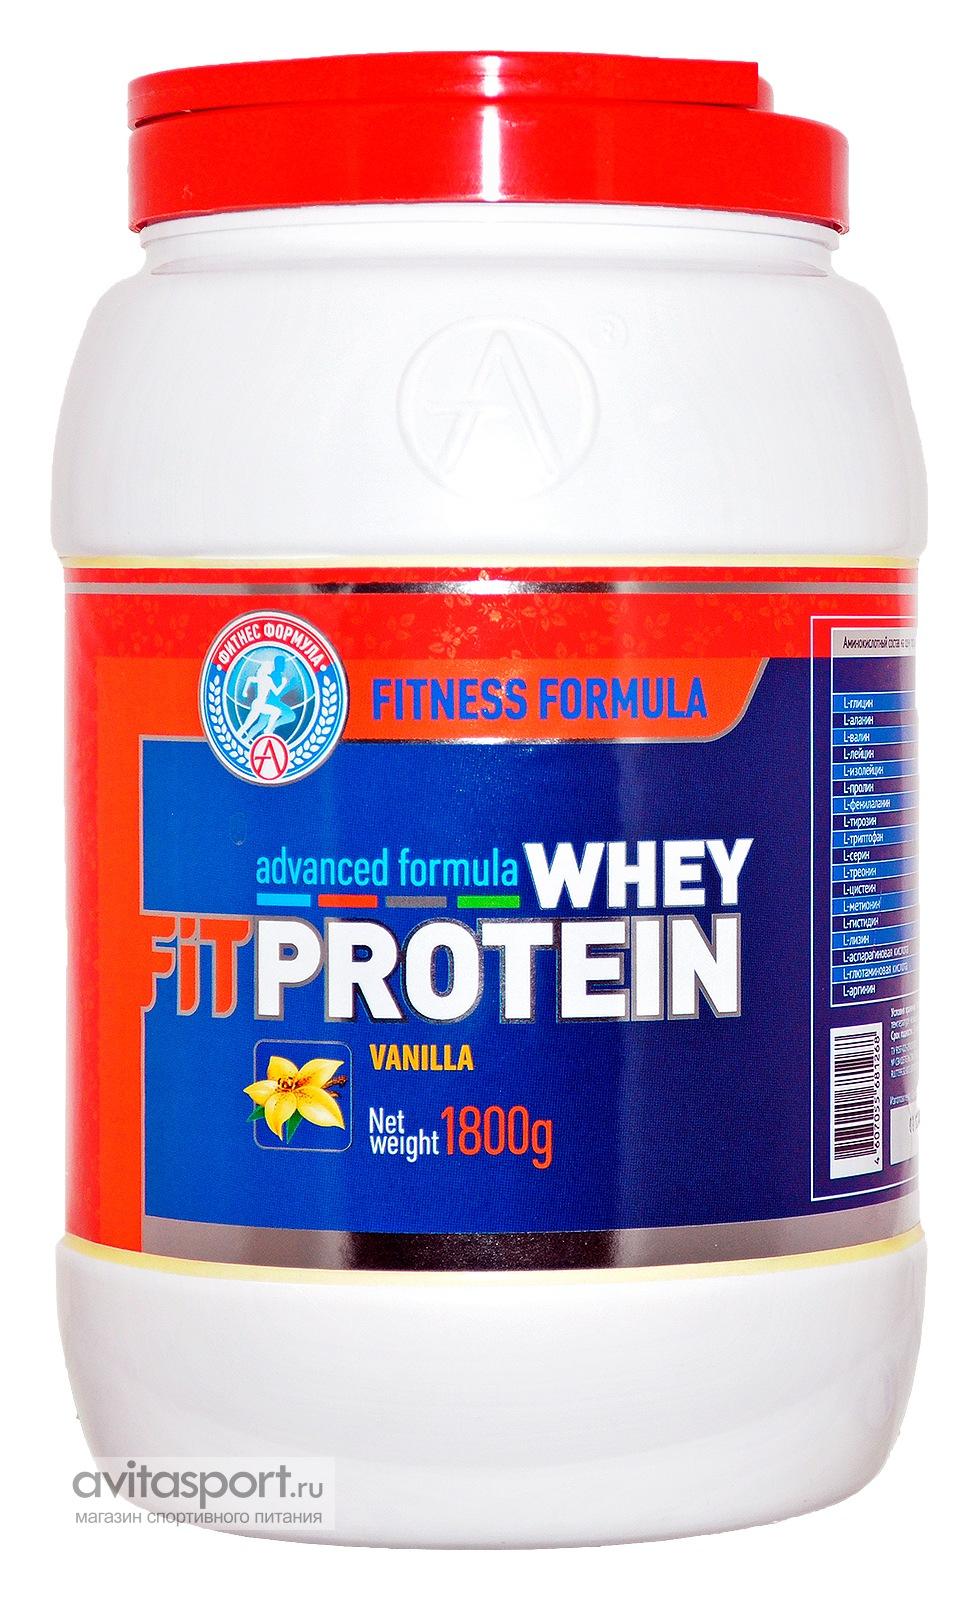 спорт магазин протеин купить